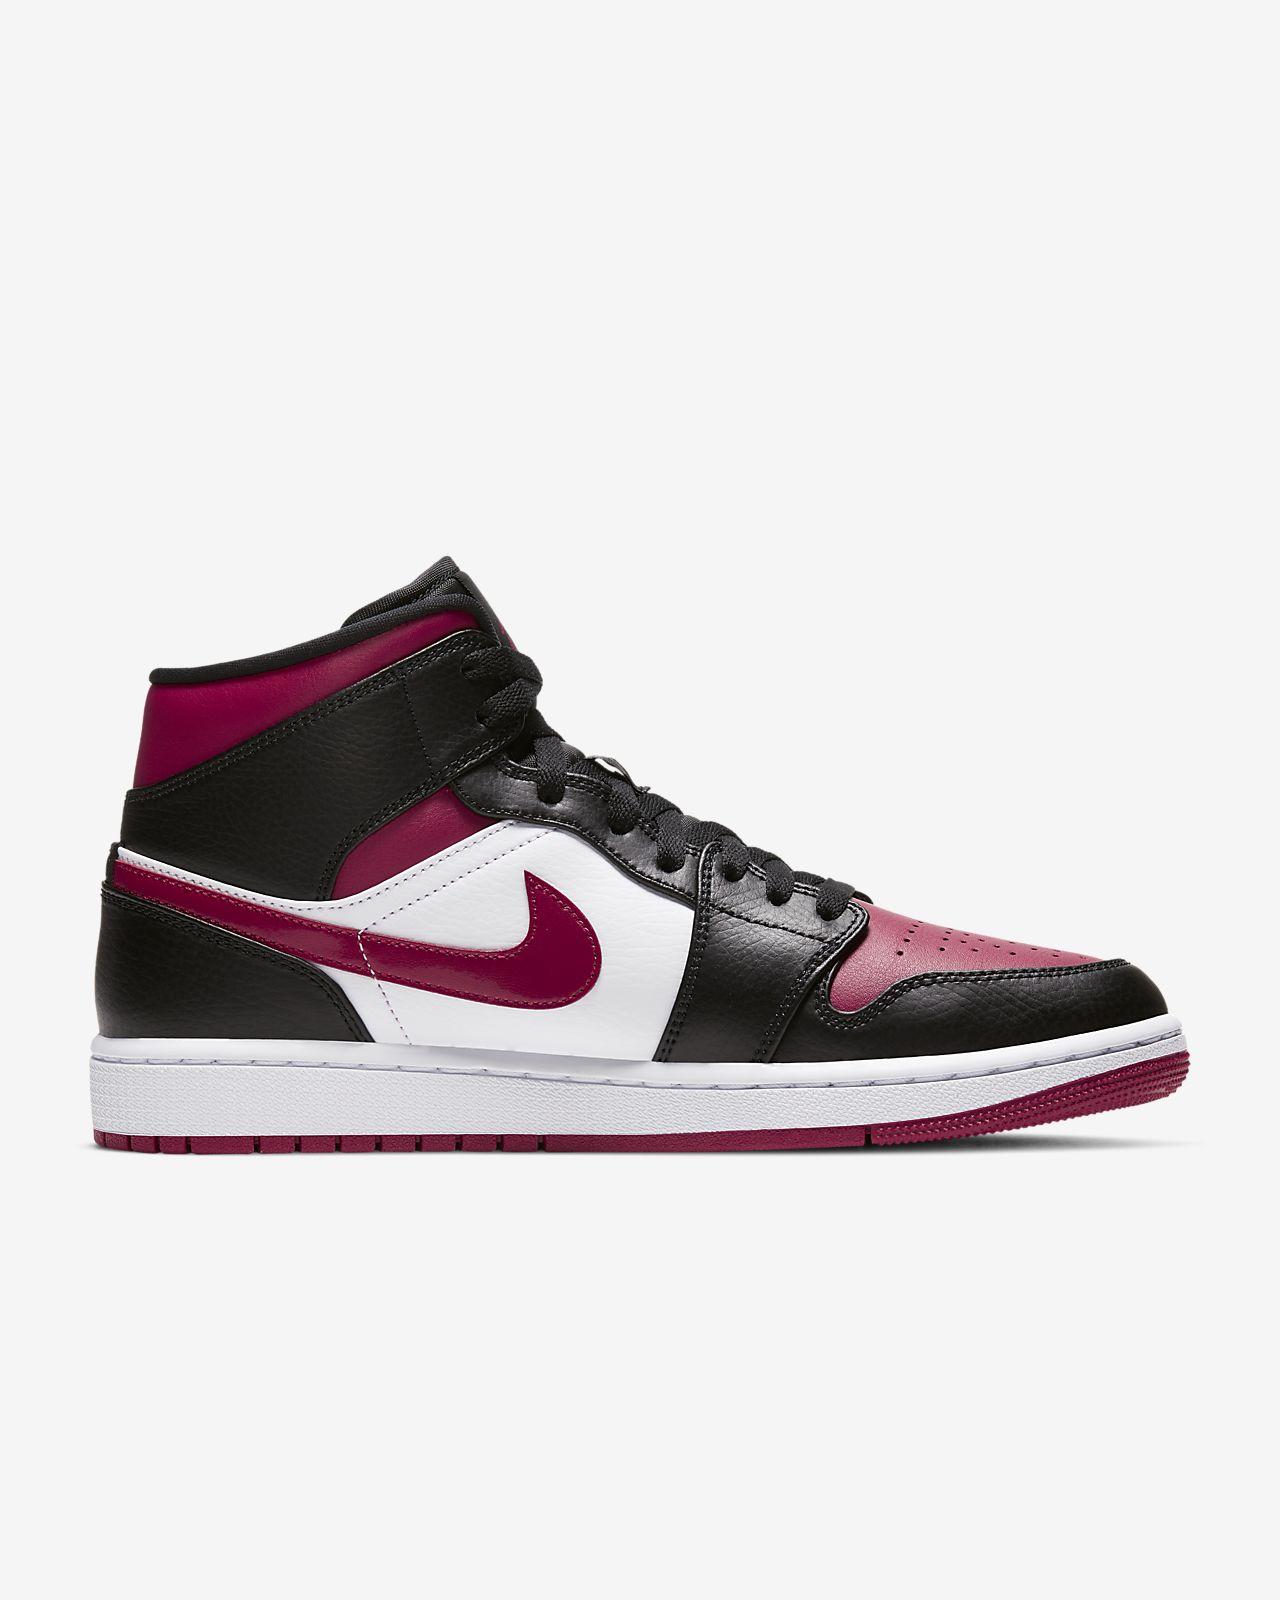 cheap retro jordans sneakers shoes: [